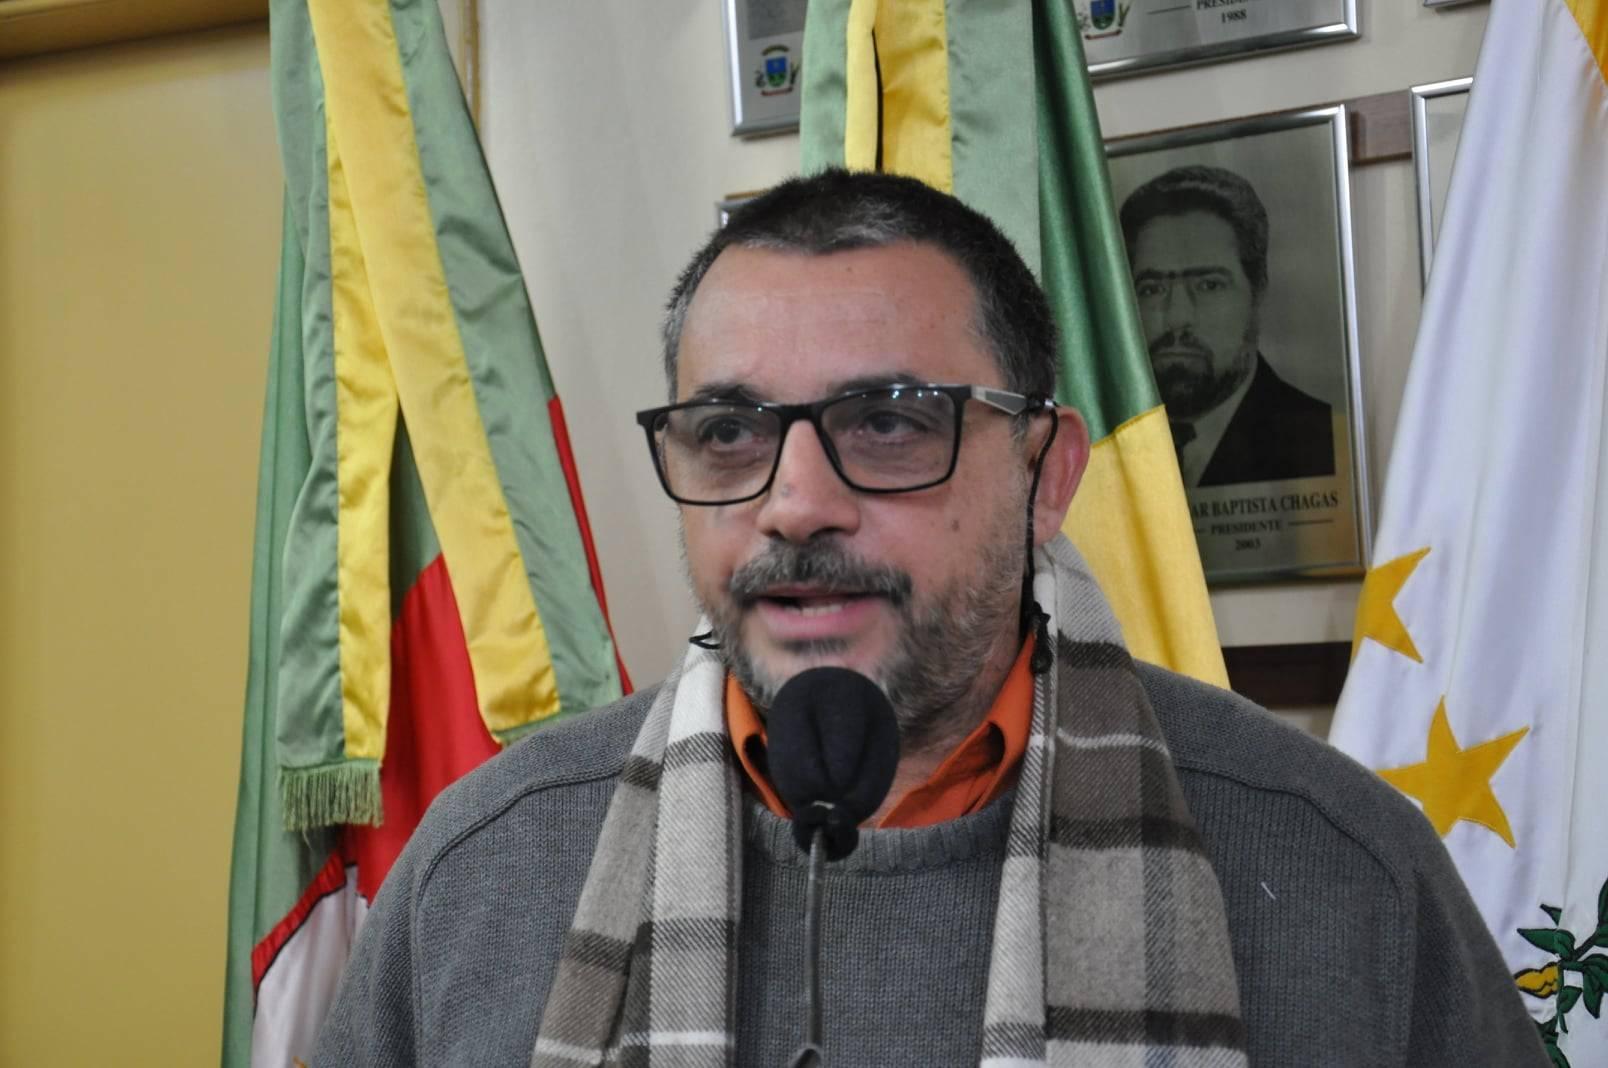 Vereador Valmir comenta as principais demandas trabalhadas na Casa Legislativa